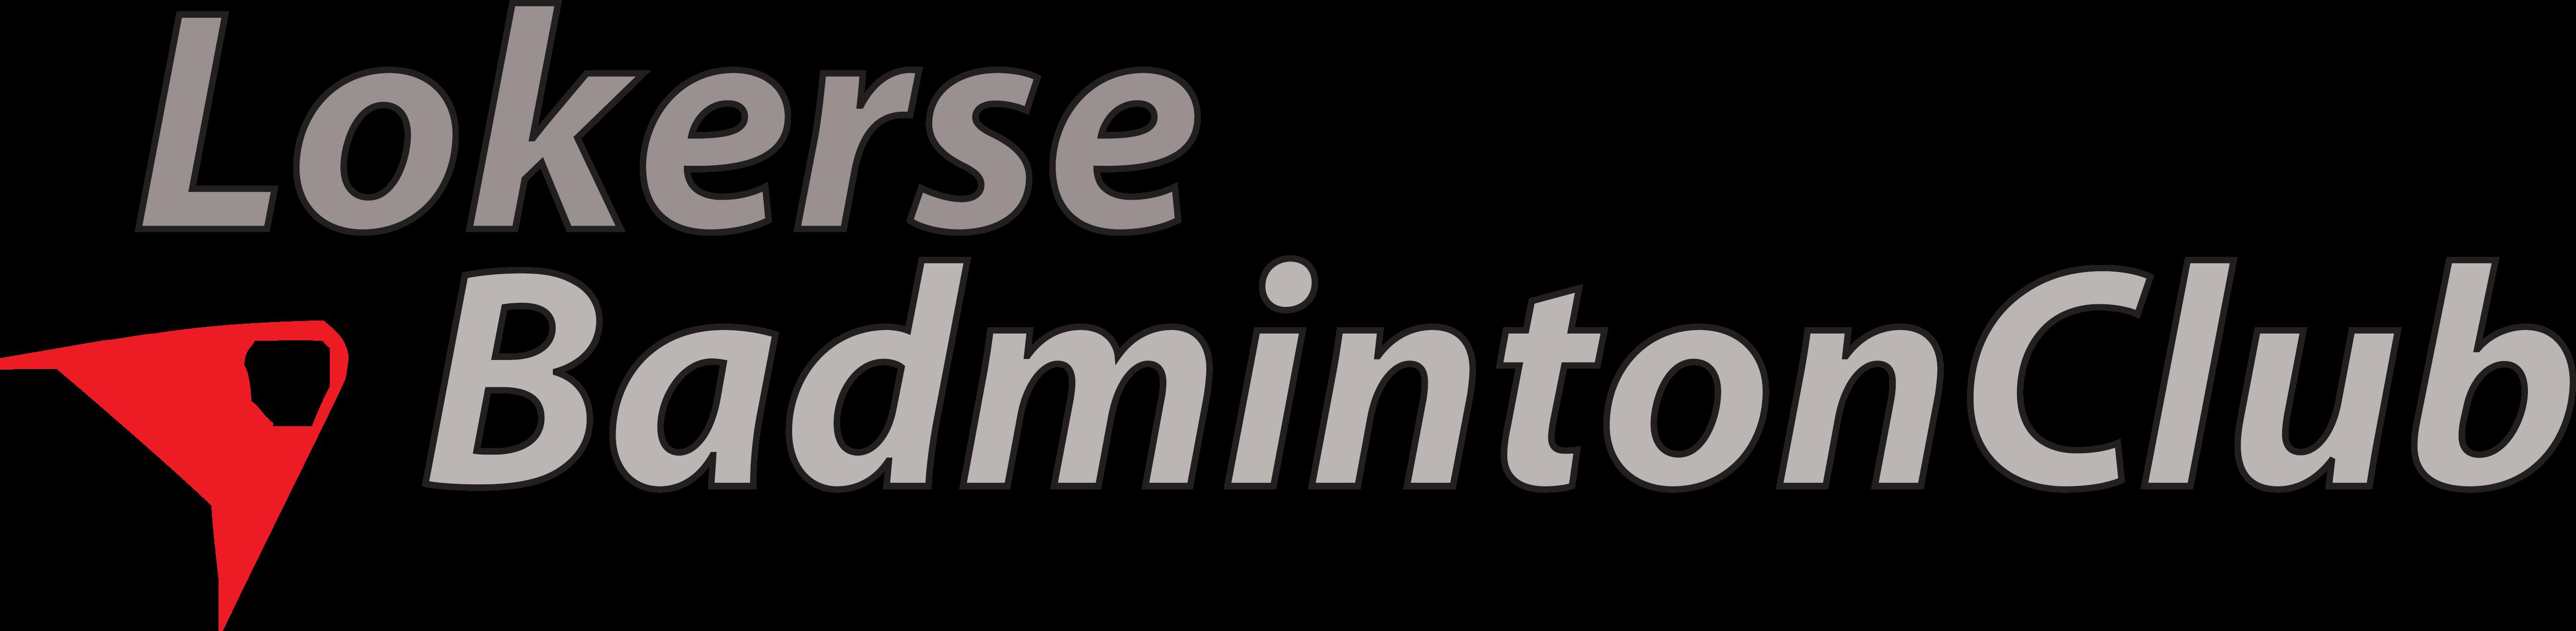 cropped-logo-lbc-2010-transparant.png